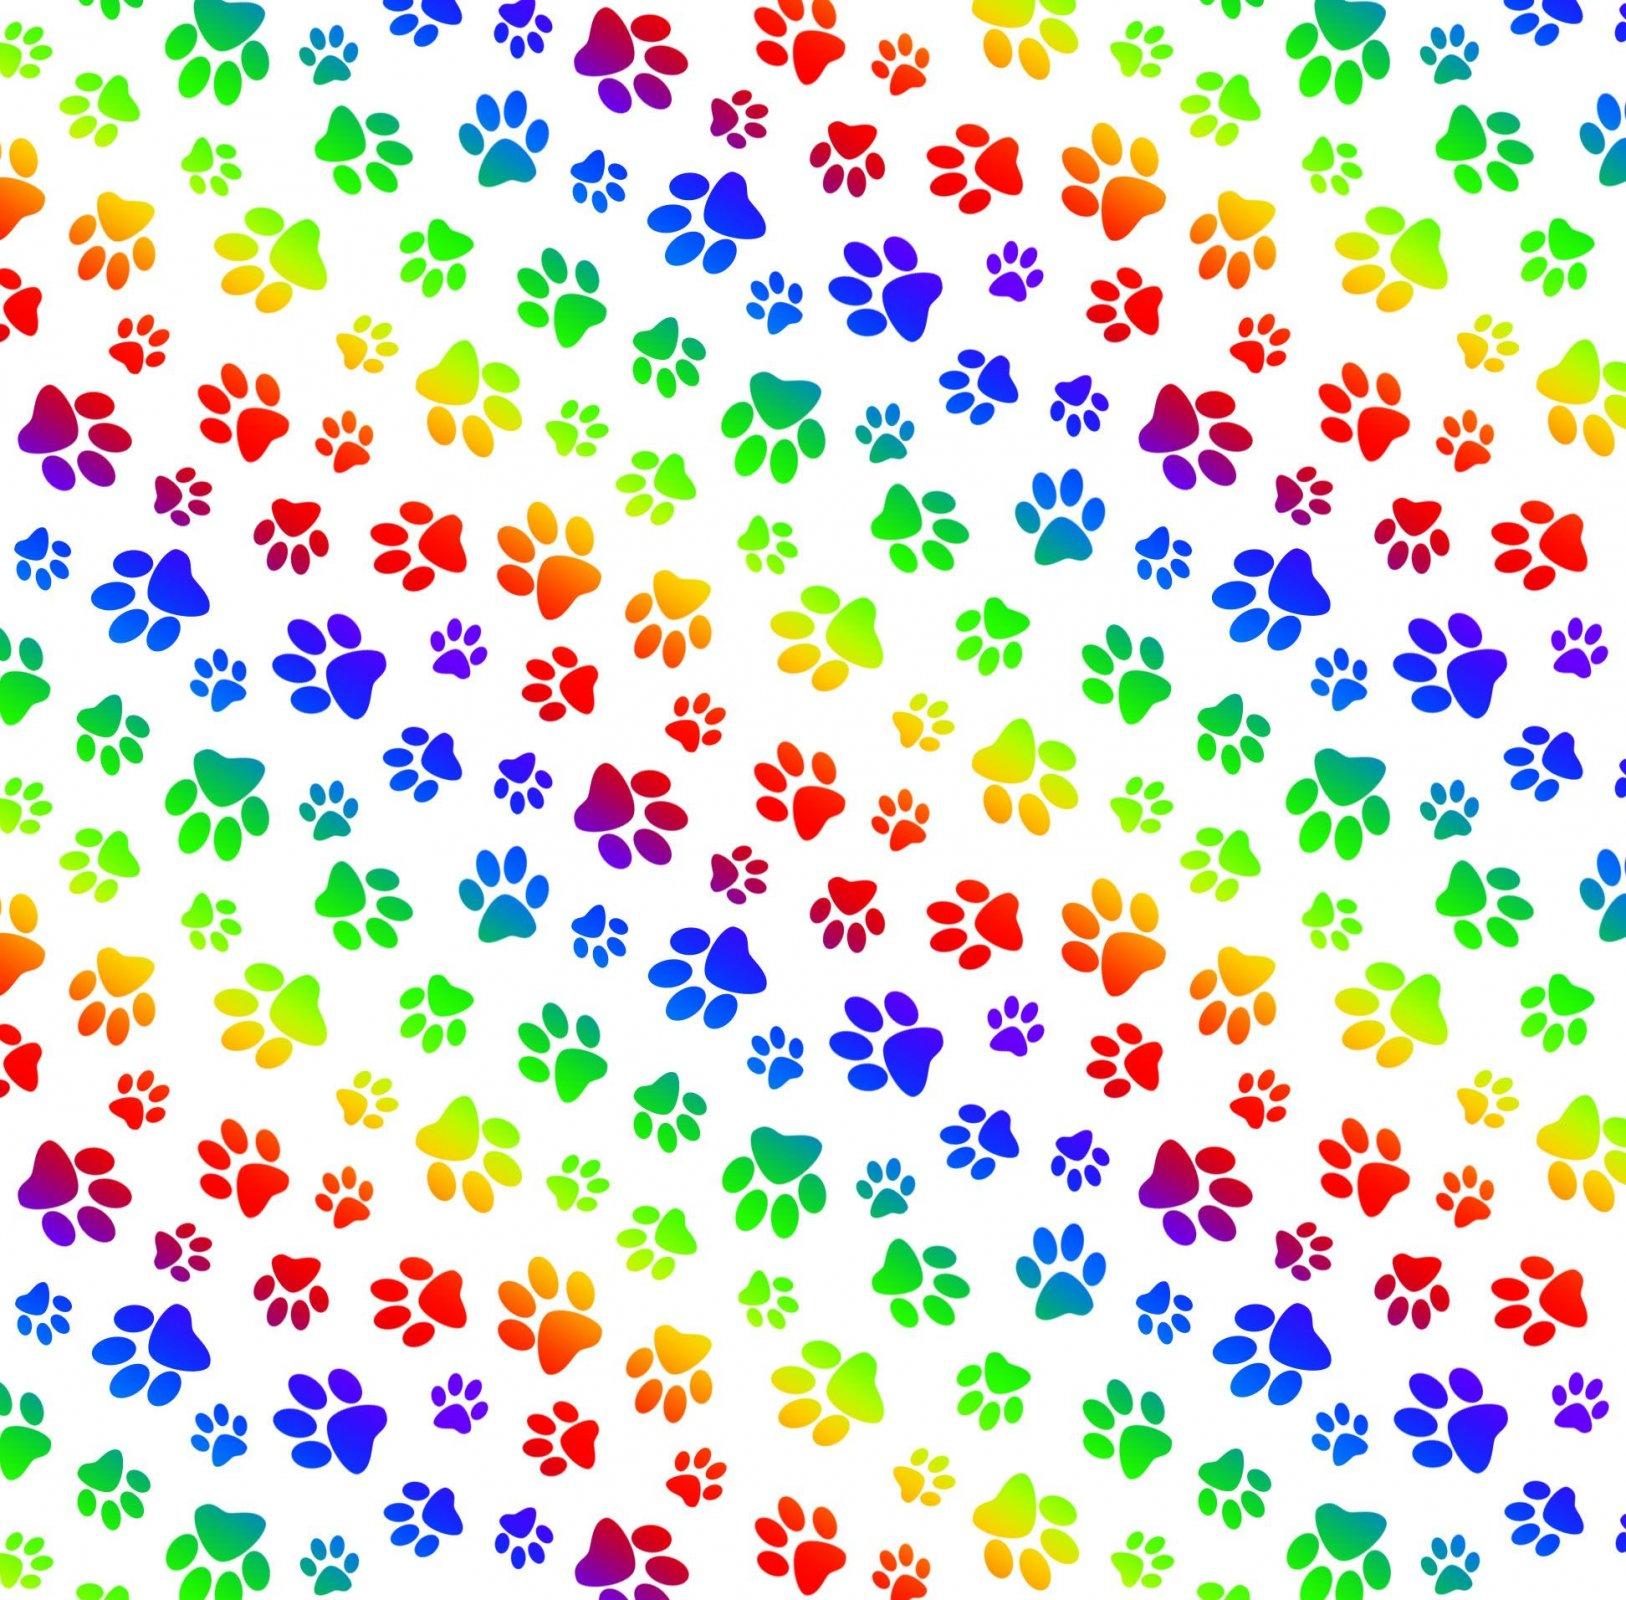 ES-Rainbow Collection 660 White - Paw Prints